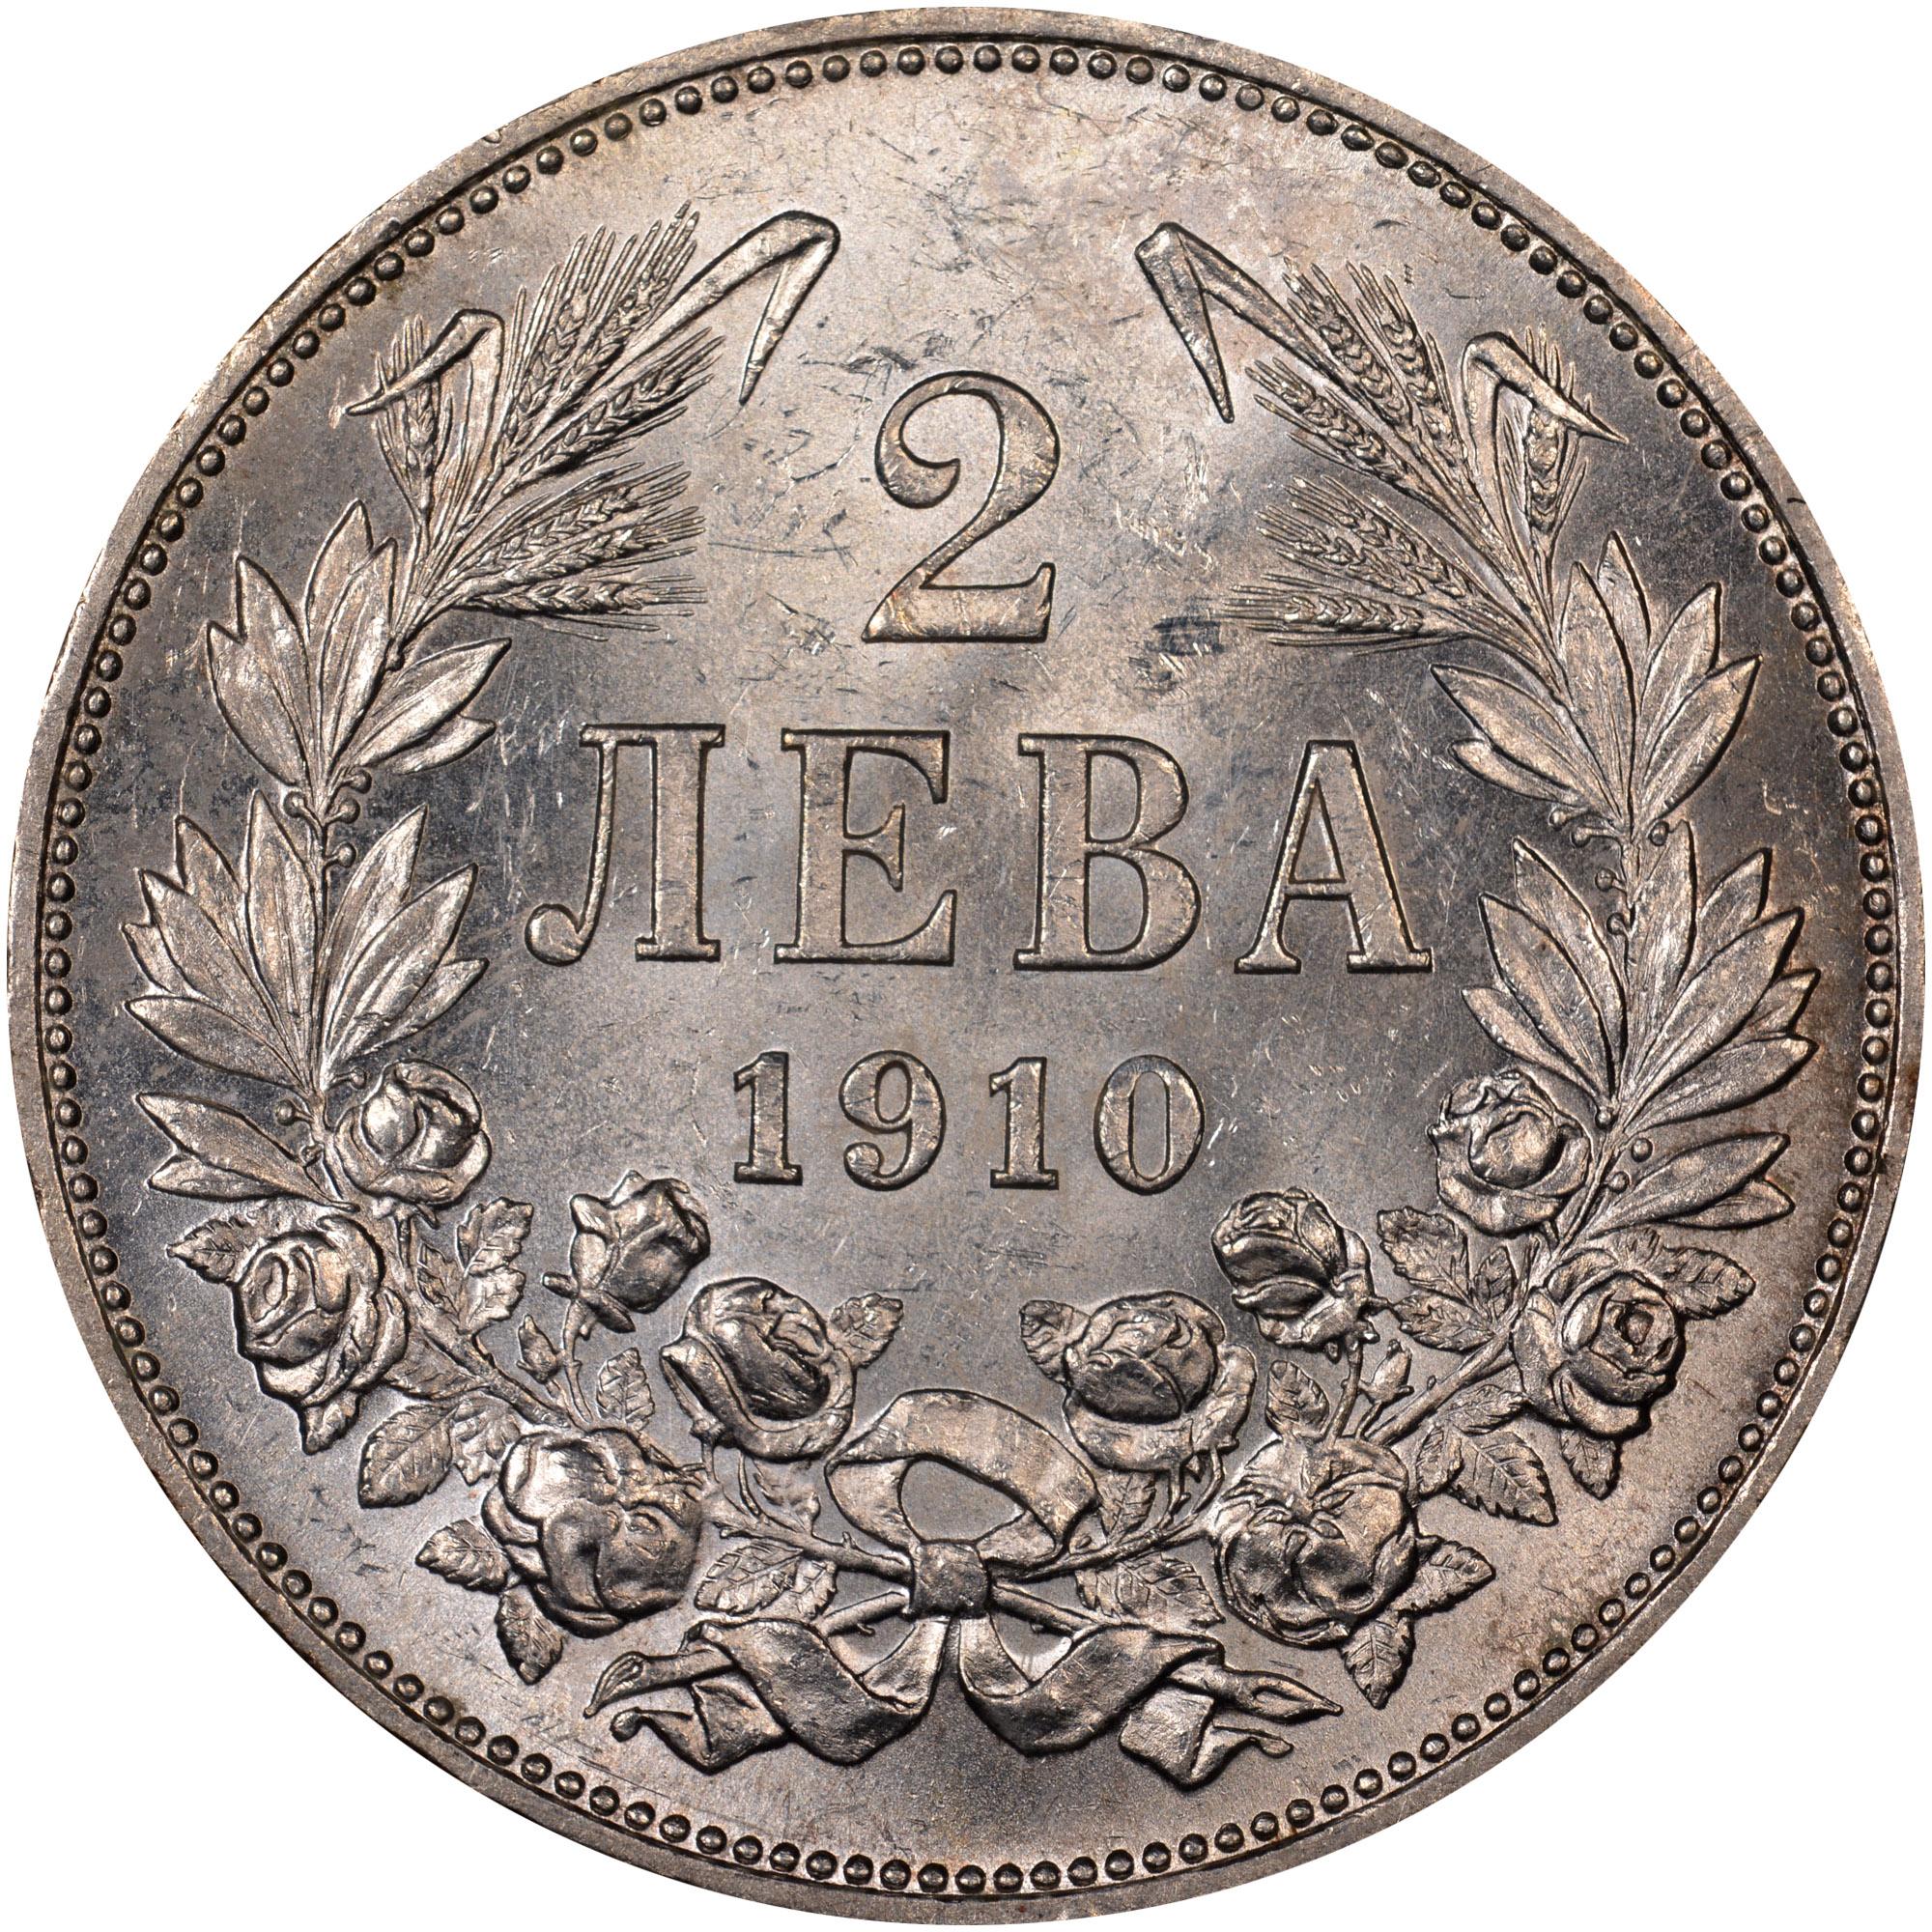 1910 Bulgaria 2 Leva reverse